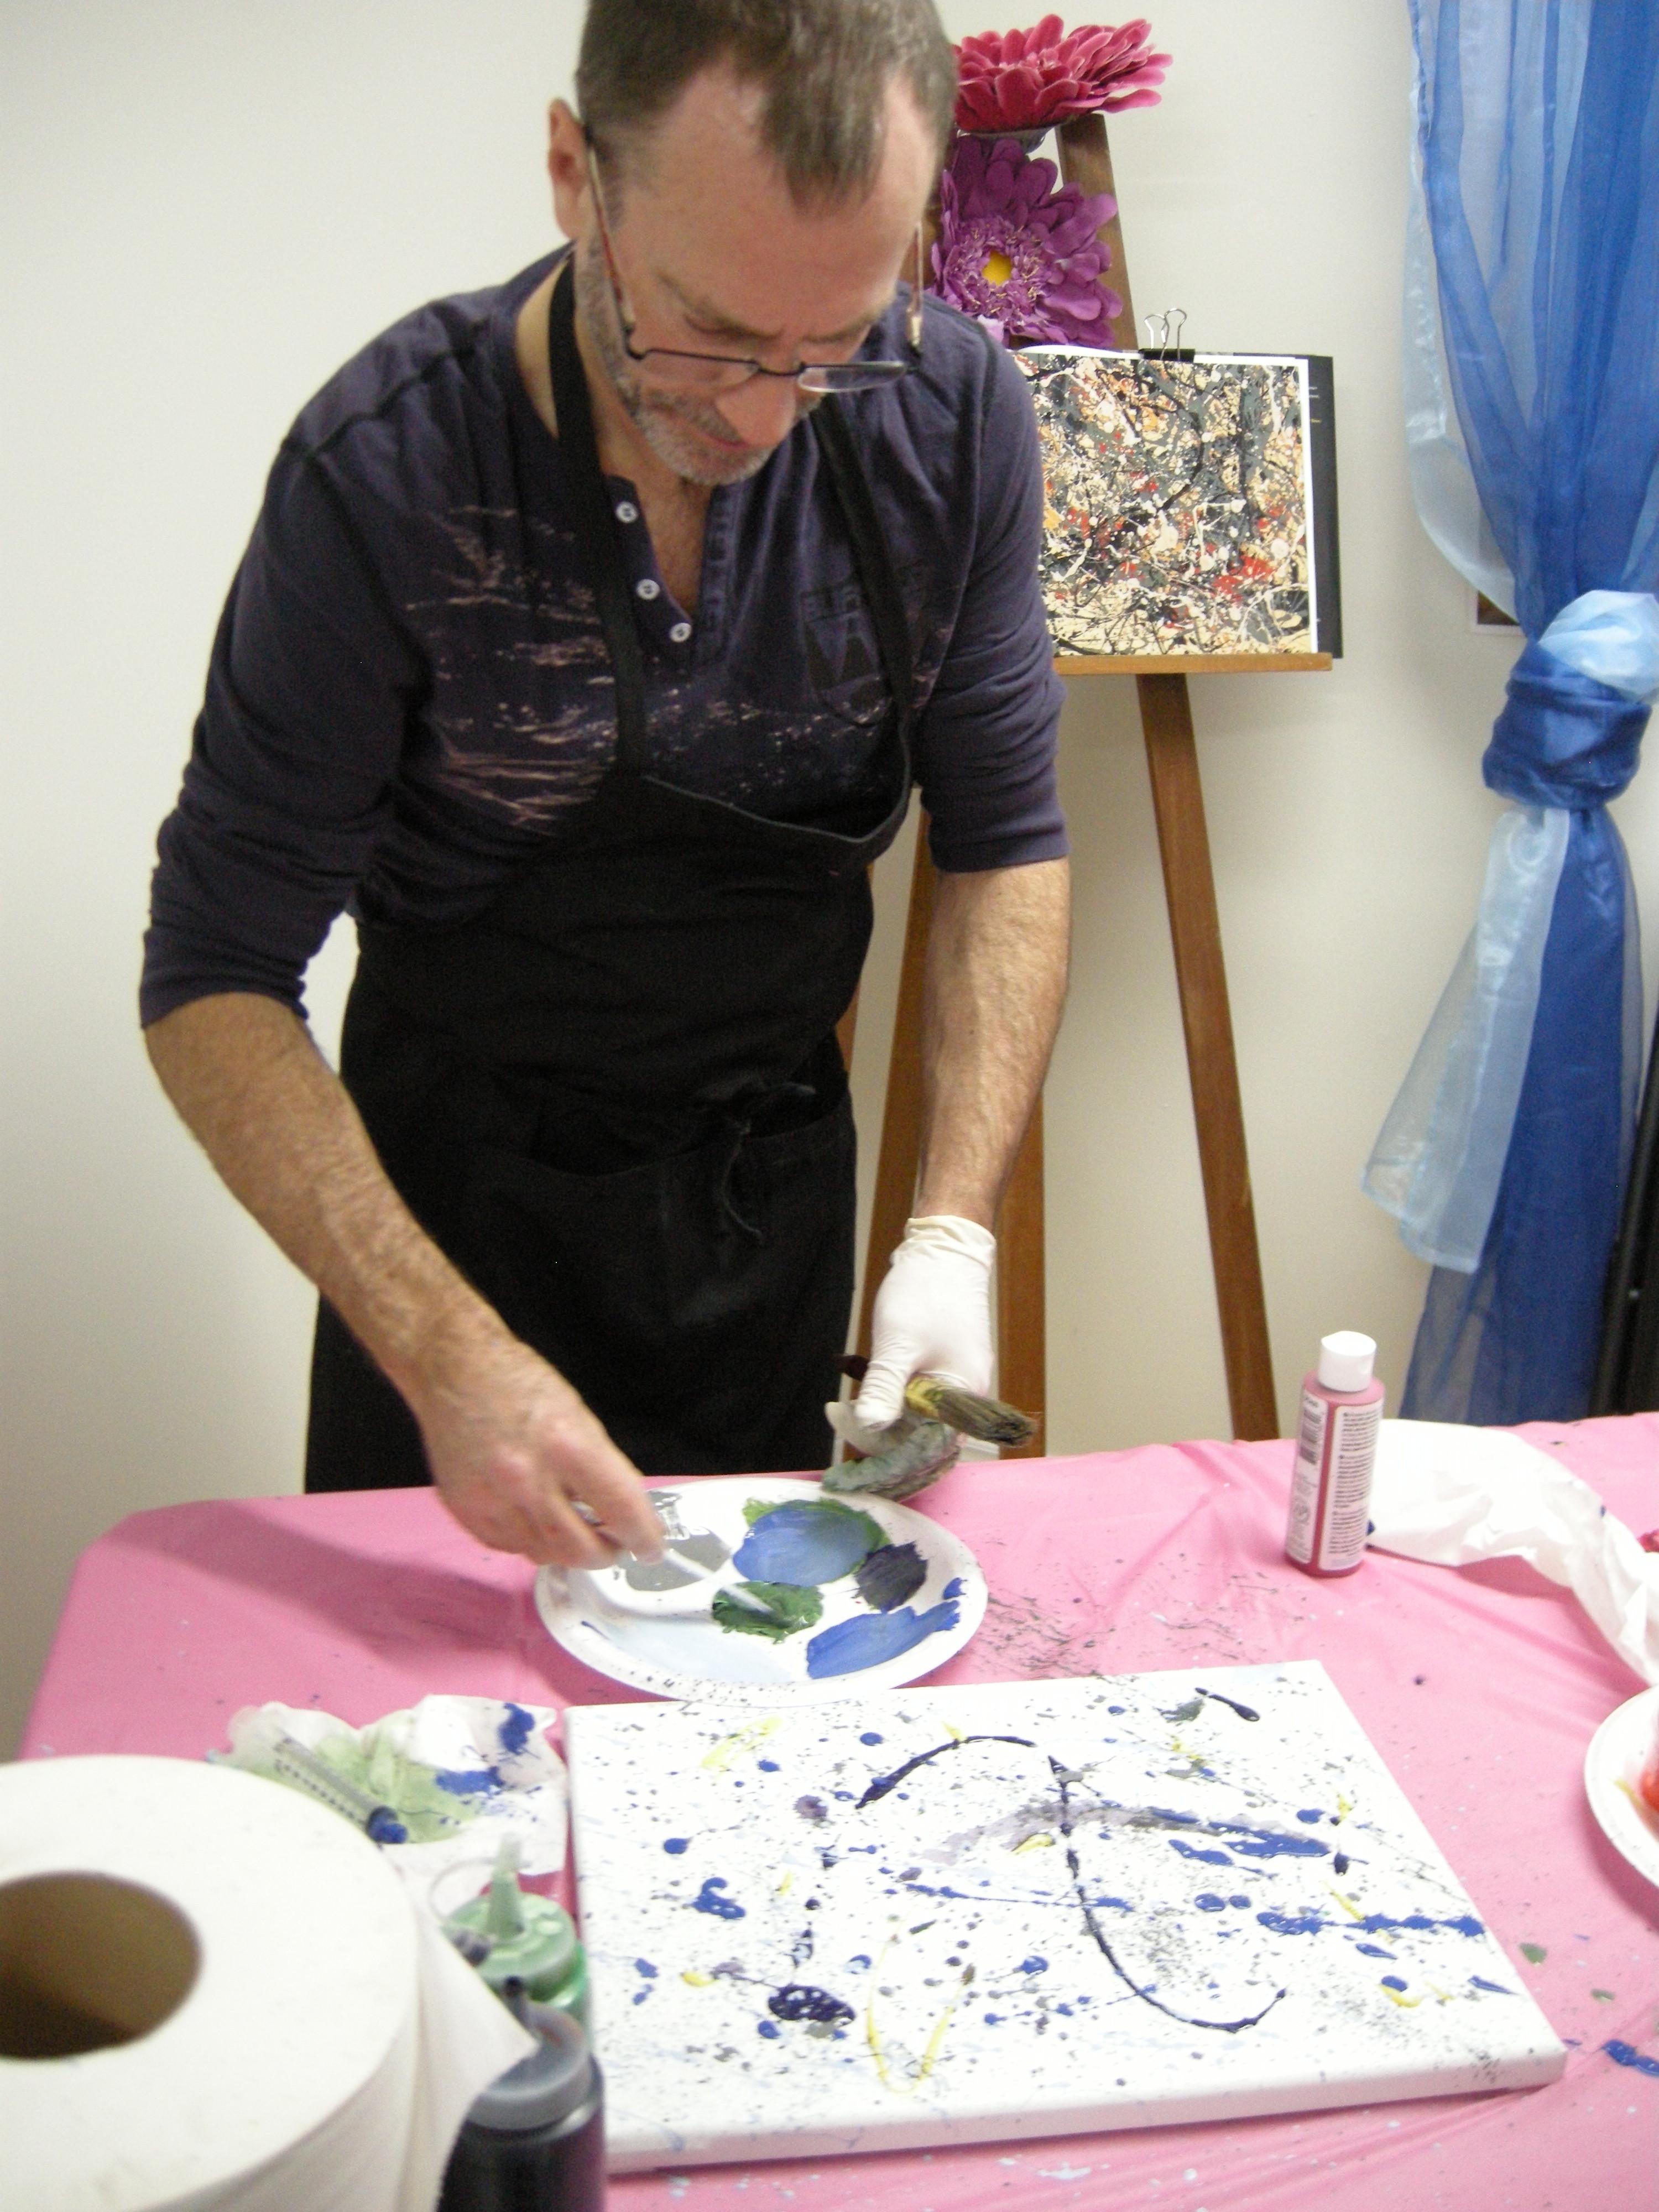 painter5